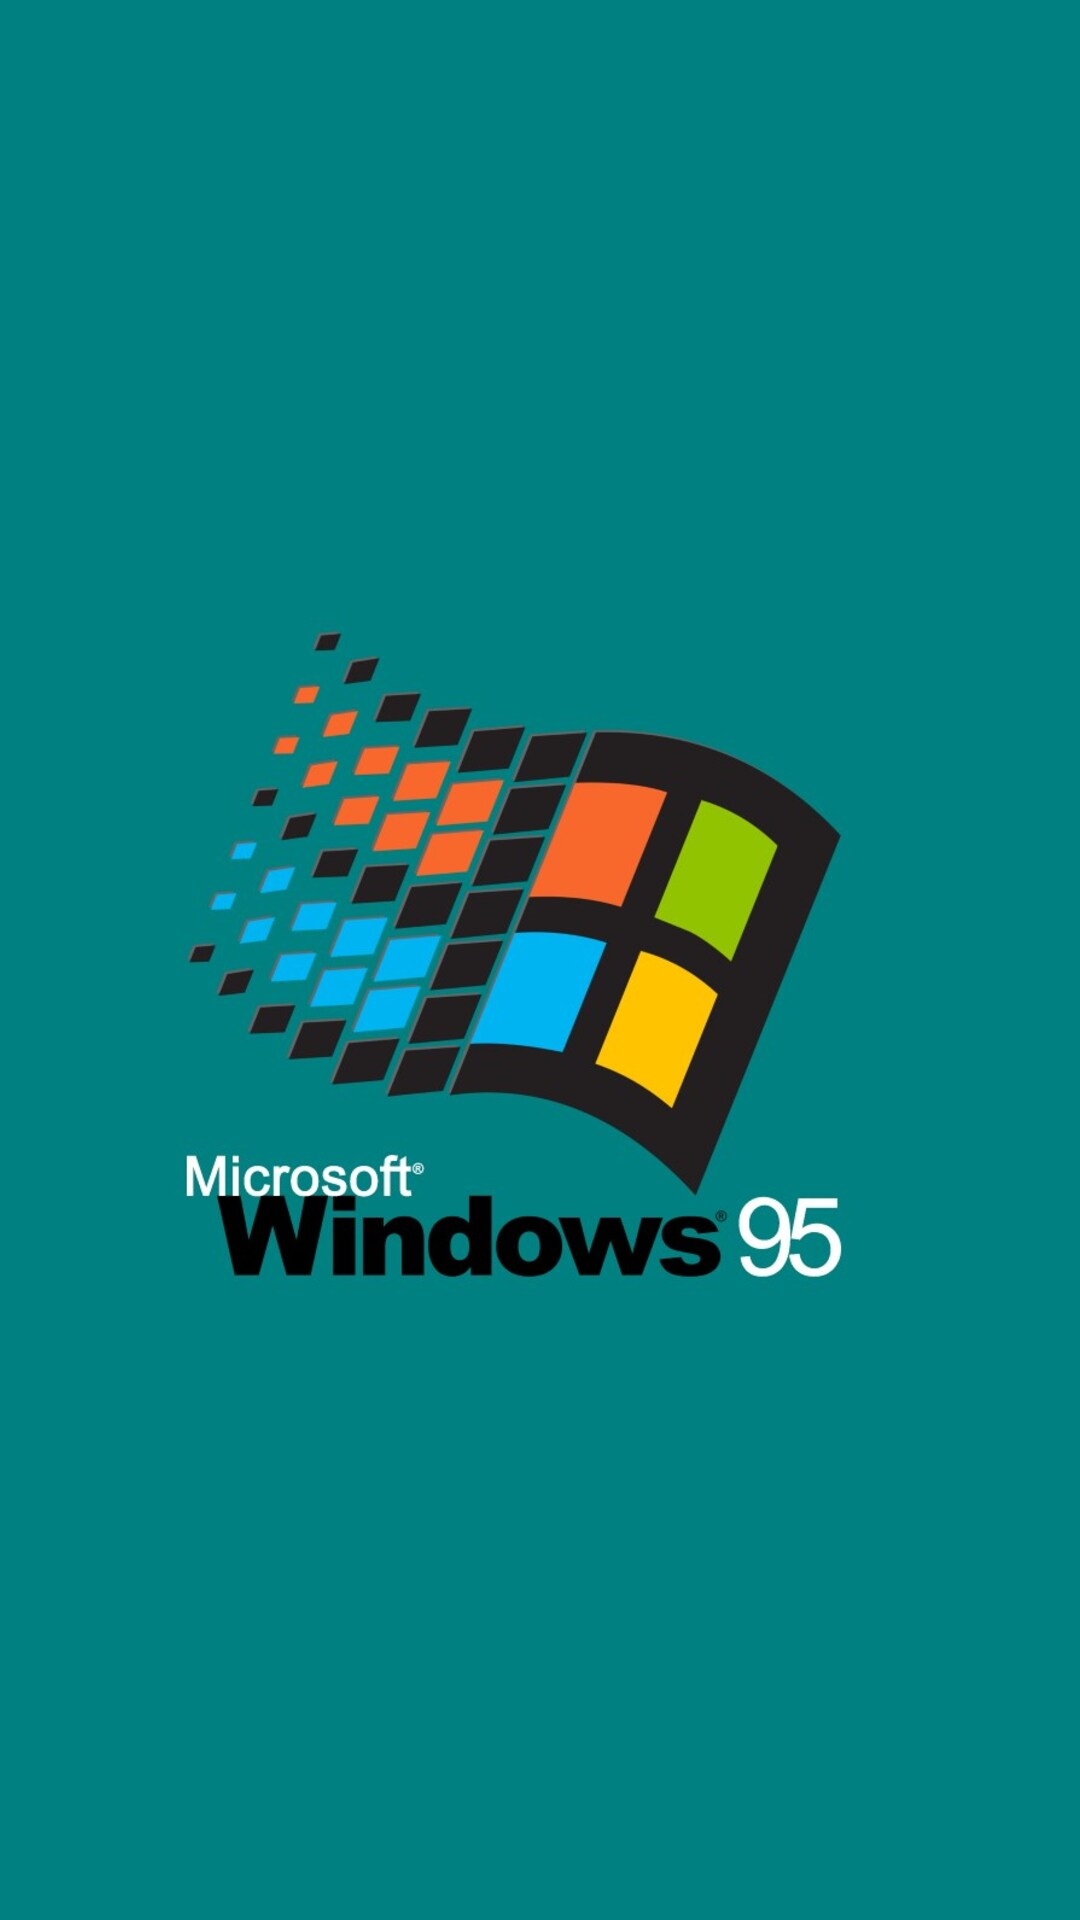 3d Hd Vaporwave Wallpaper 1080x1920 Windows 95 Iphone 7 6s 6 Plus Pixel Xl One